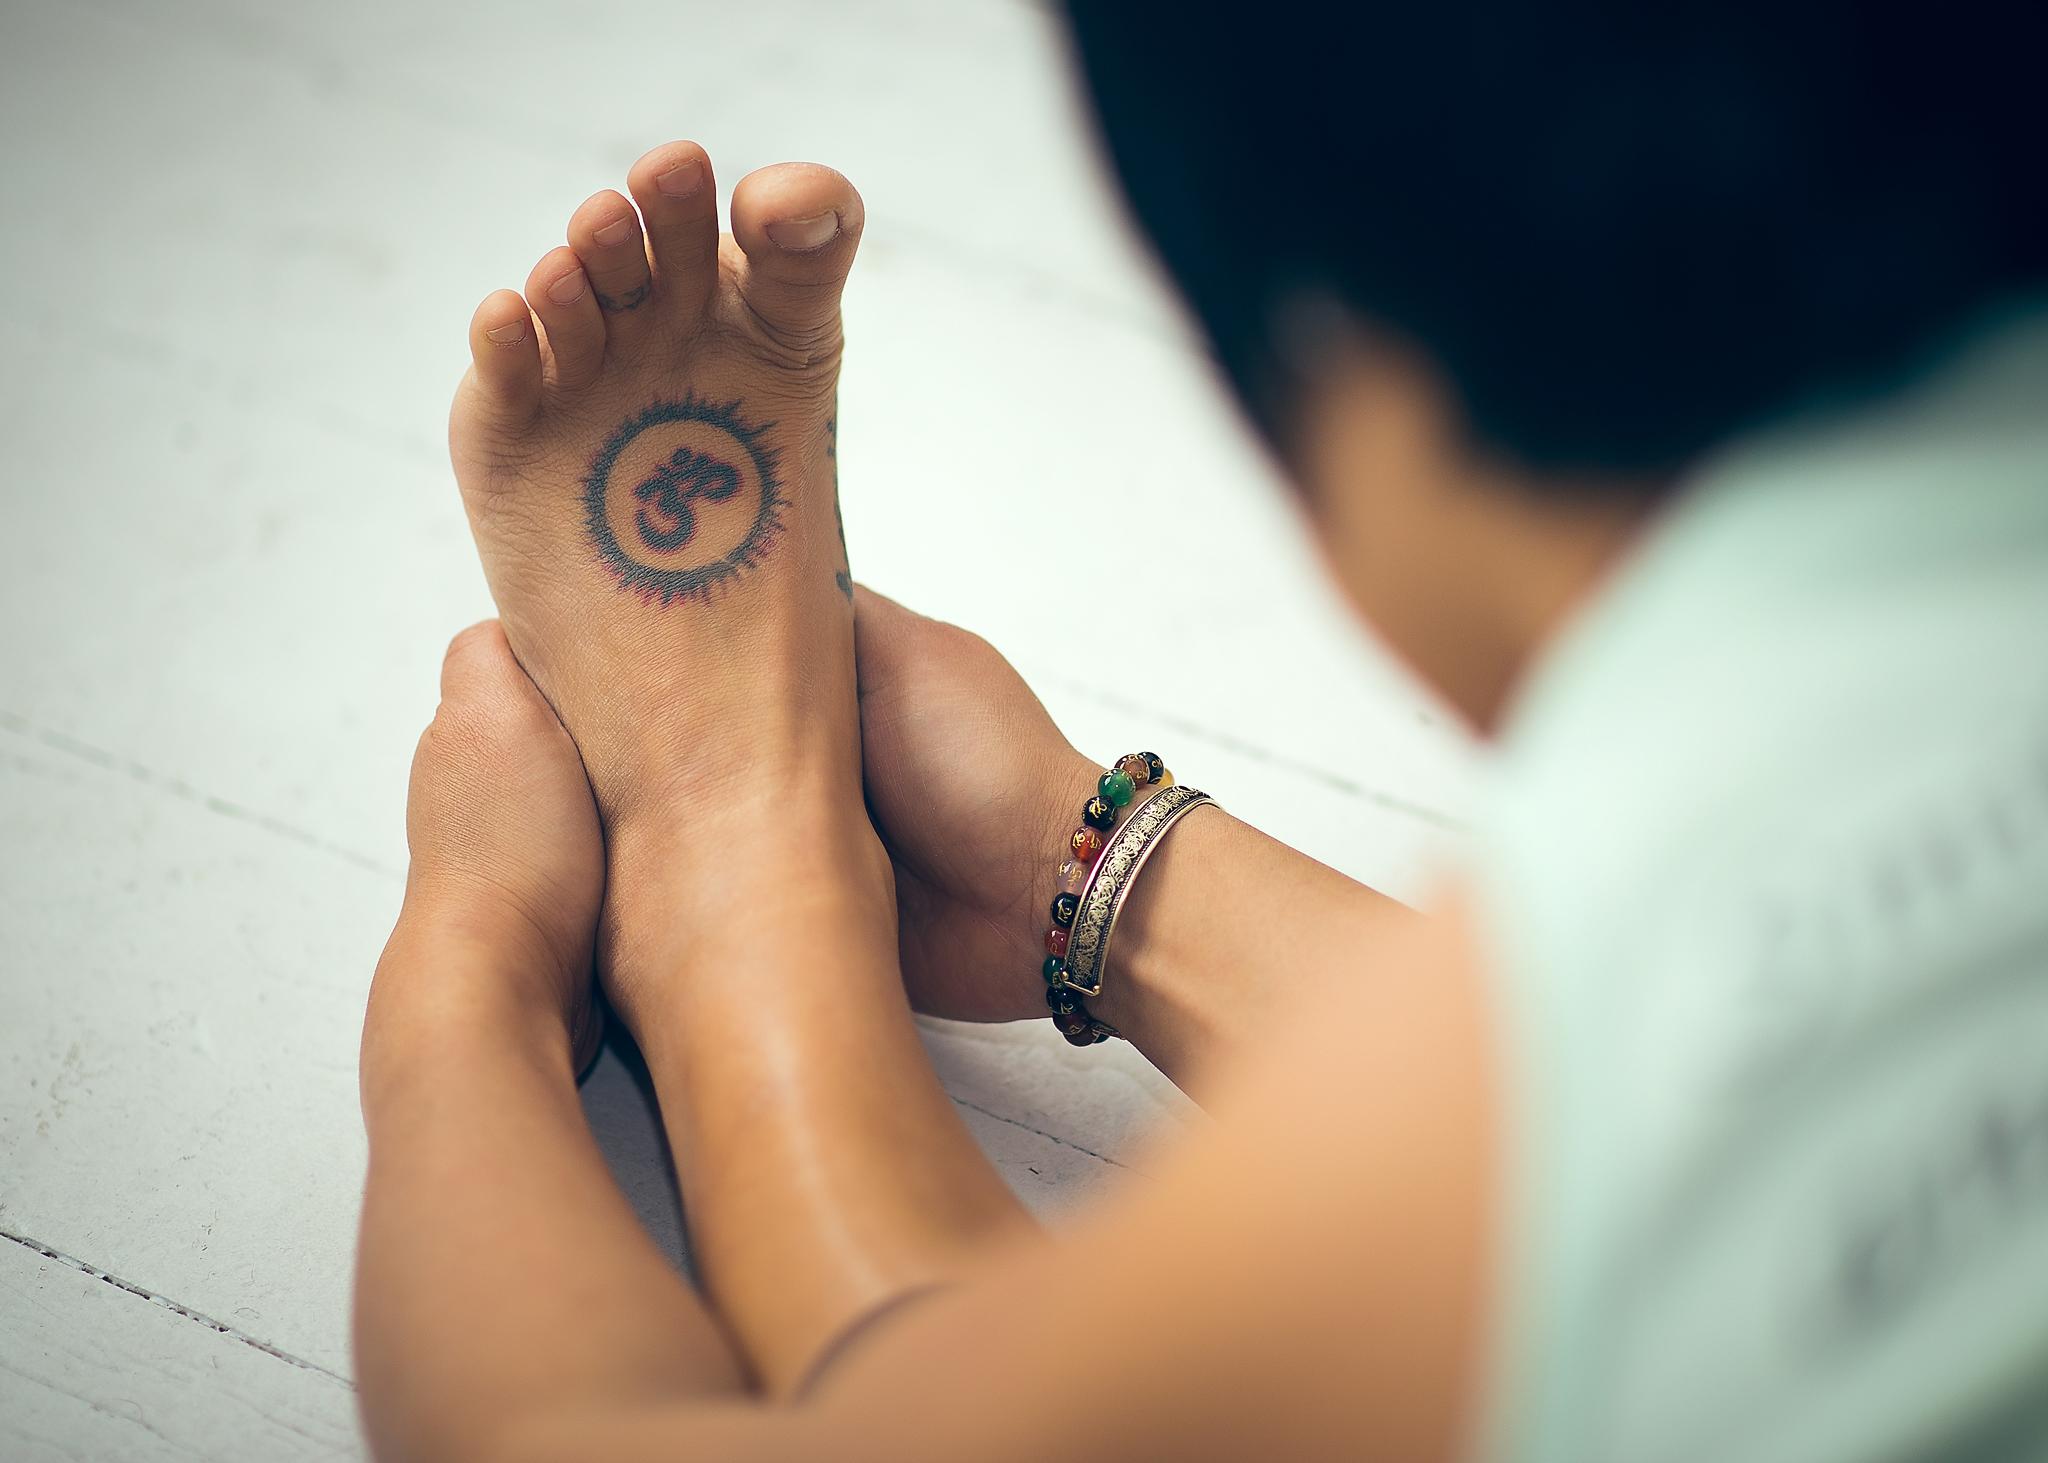 yin-yoga-training-meditation-mindfulness-kingston-ontario-canada